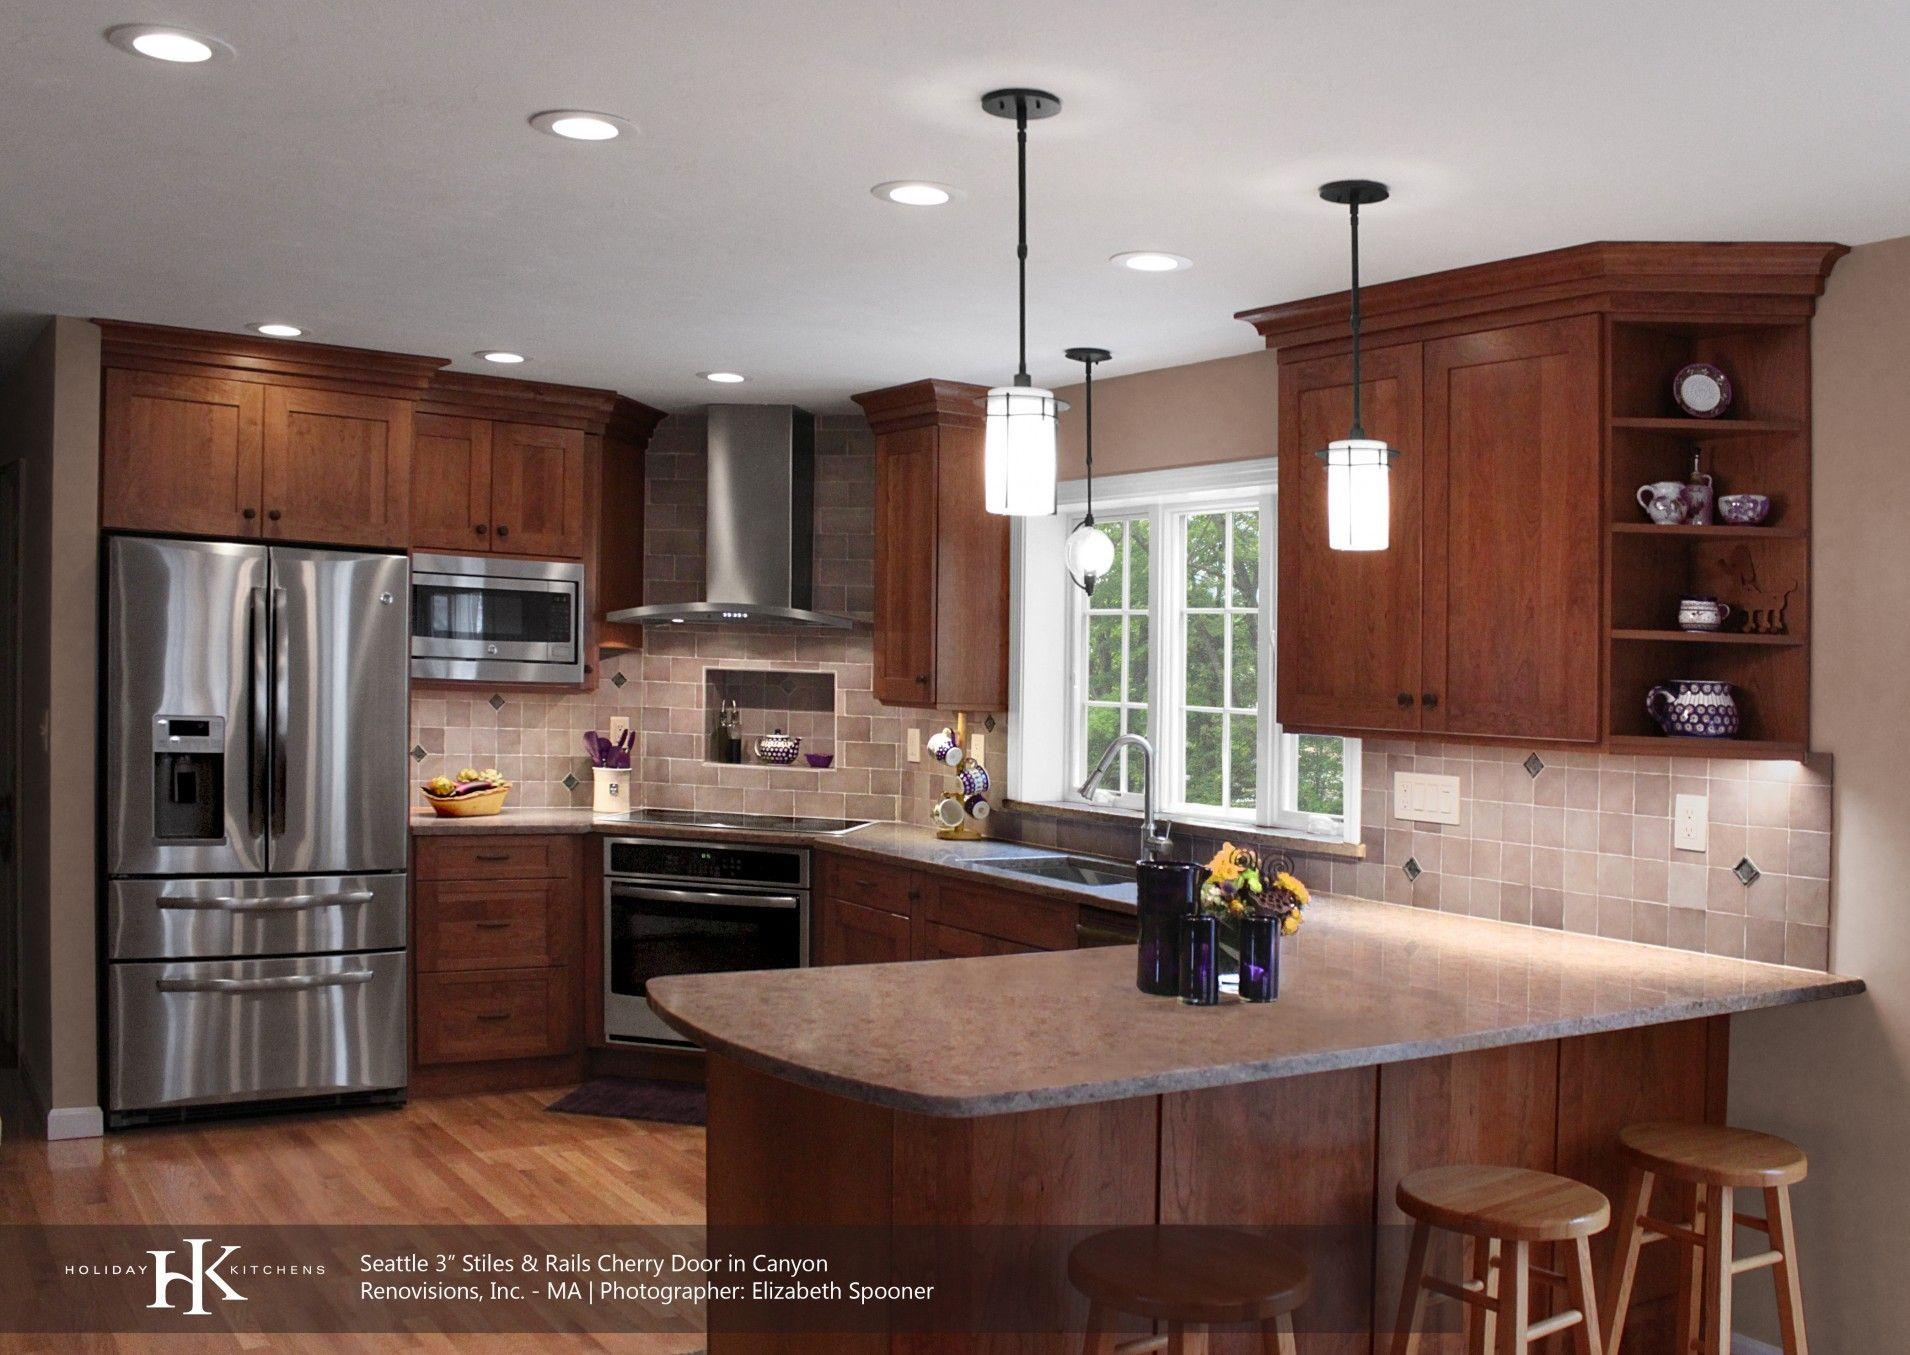 Holiday Kitchens Media Gallery Kitchen Layout Kitchen Cabinet Layout Kitchen Design